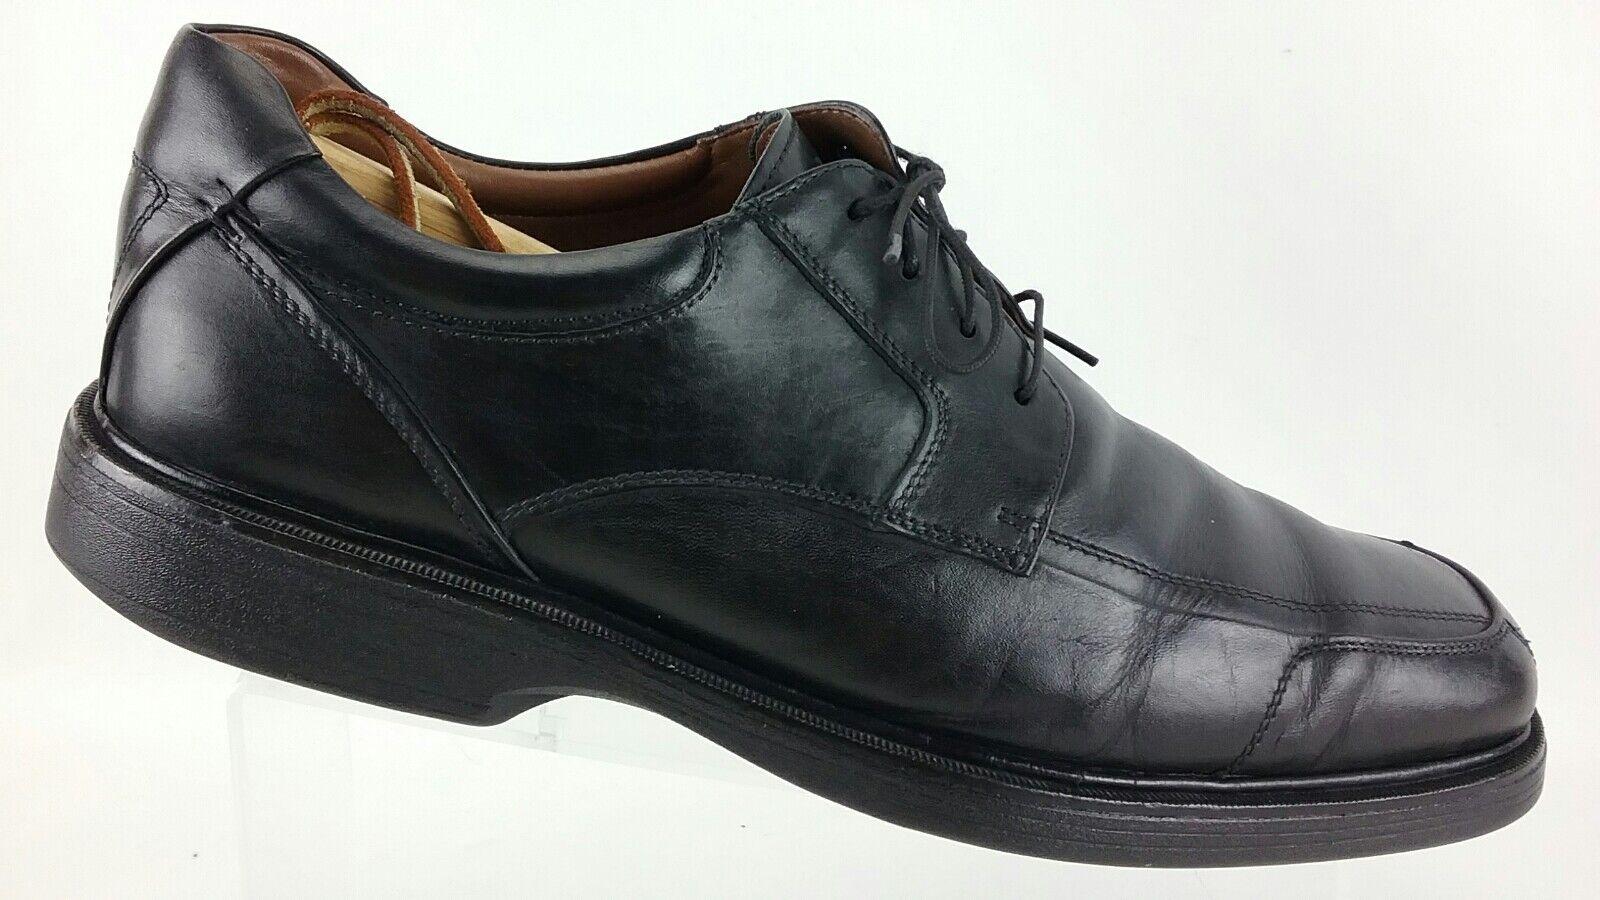 5ab0d562570 Murphy Men's Waterproof Apron Toe Oxford shoes 12M Black Leather R33 ...